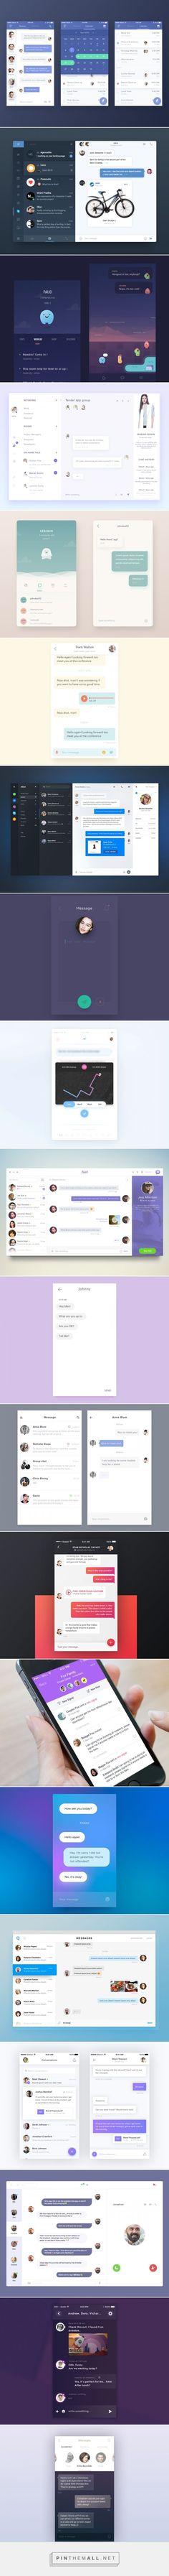 Chat/Messaging UI Inspiration — Muzli -Design Inspiration — Medium - created via… Ui Design Mobile, Web Ui Design, Mobile Ui, Interface Web, User Interface Design, App Design Inspiration, Application Design, Ui Animation, Chat App